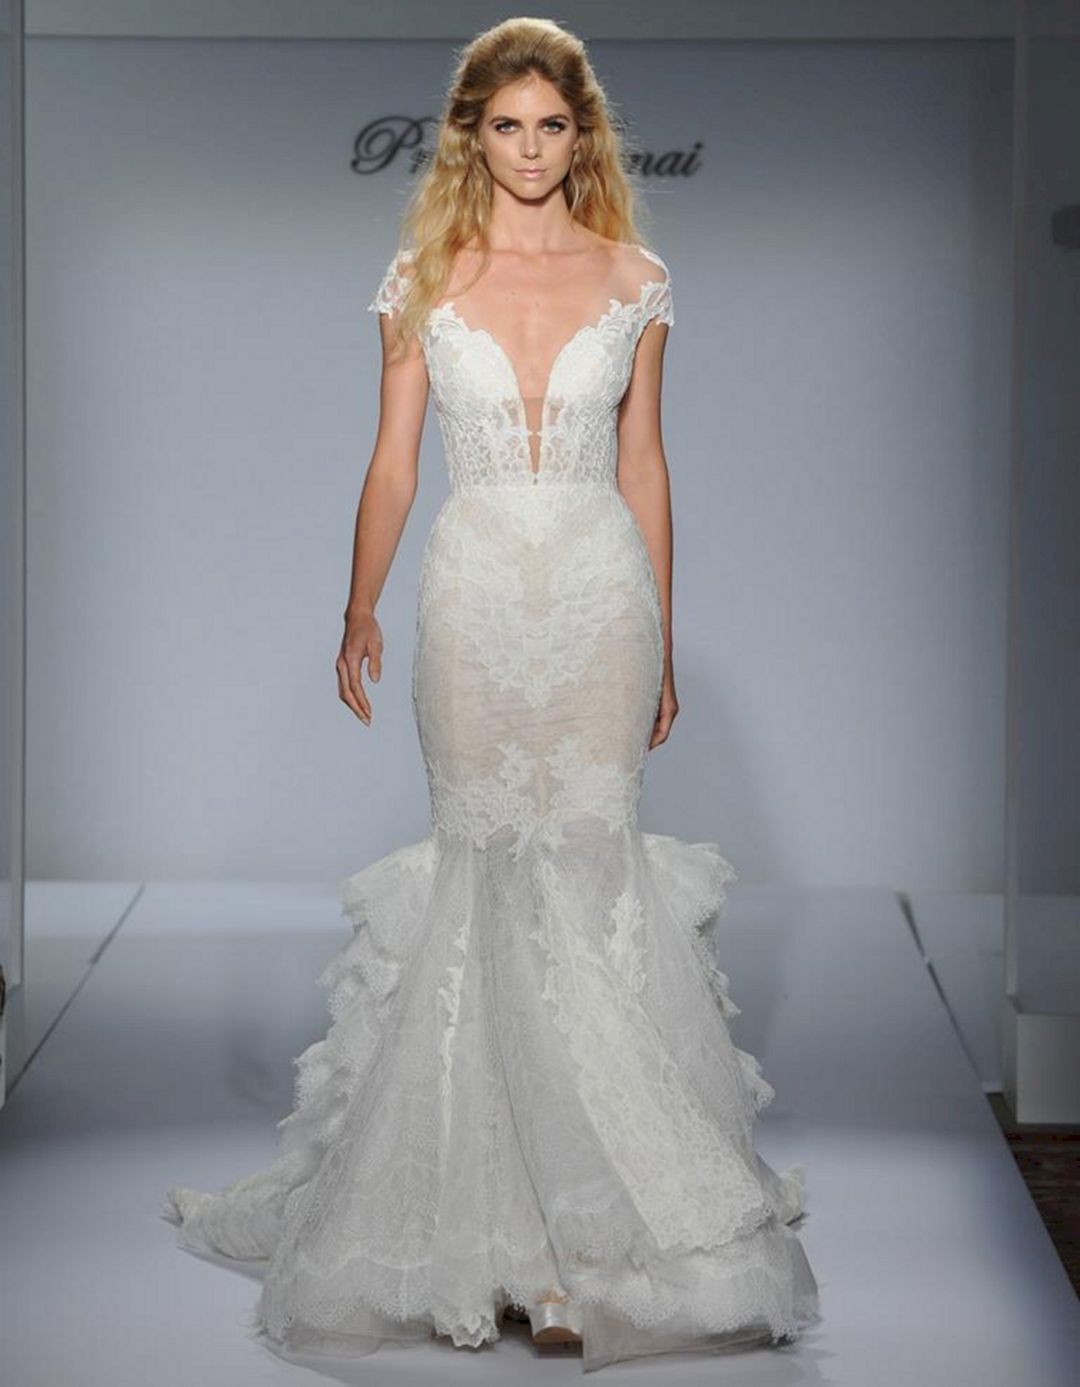 Modern Pnina Tornai Prom Dresses Illustration - All Wedding Dresses ...